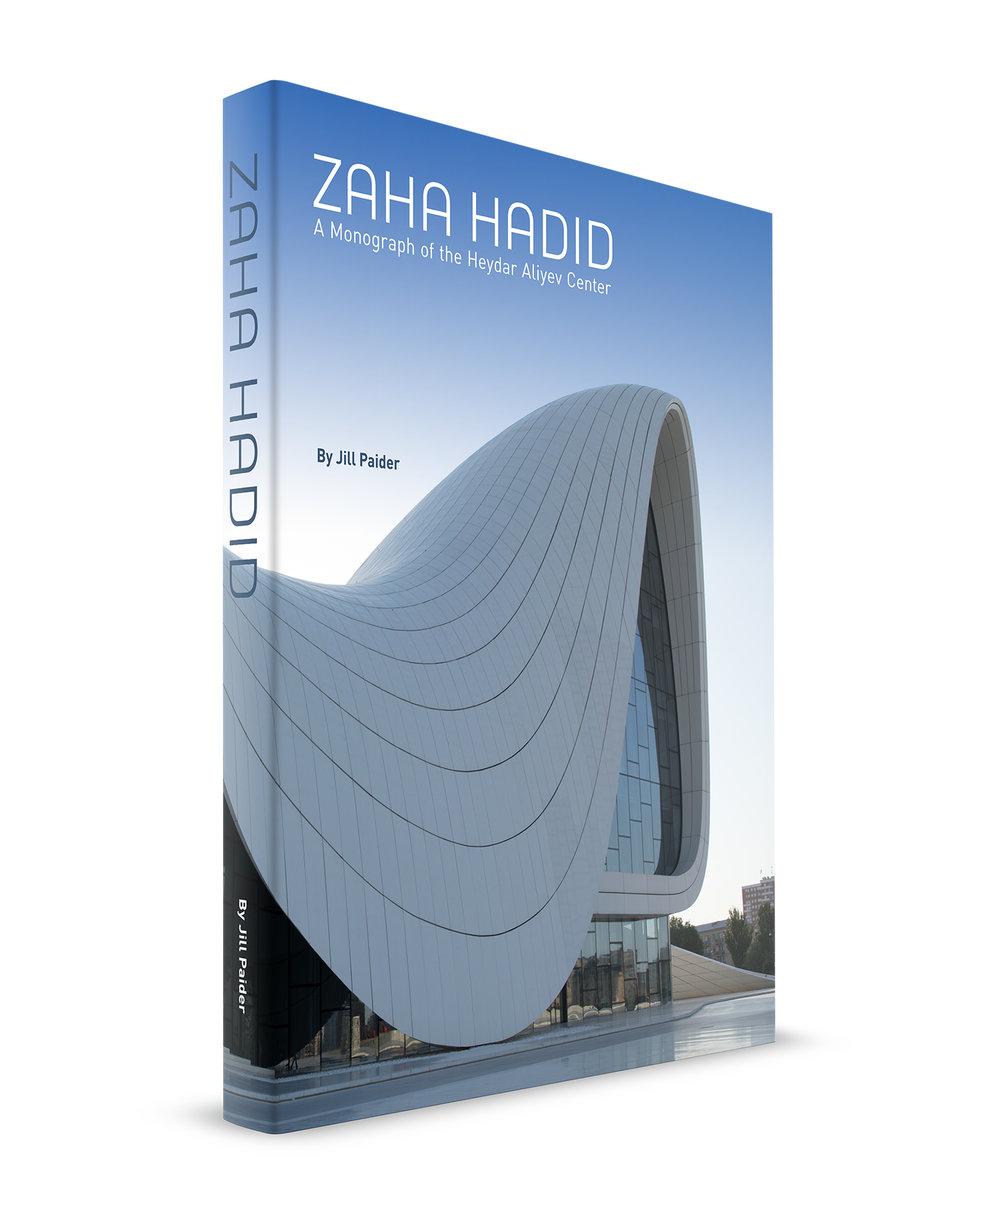 ZAHA HADID: A MONOGRAPH OF THE HEYDAR ALIYEV CENTER